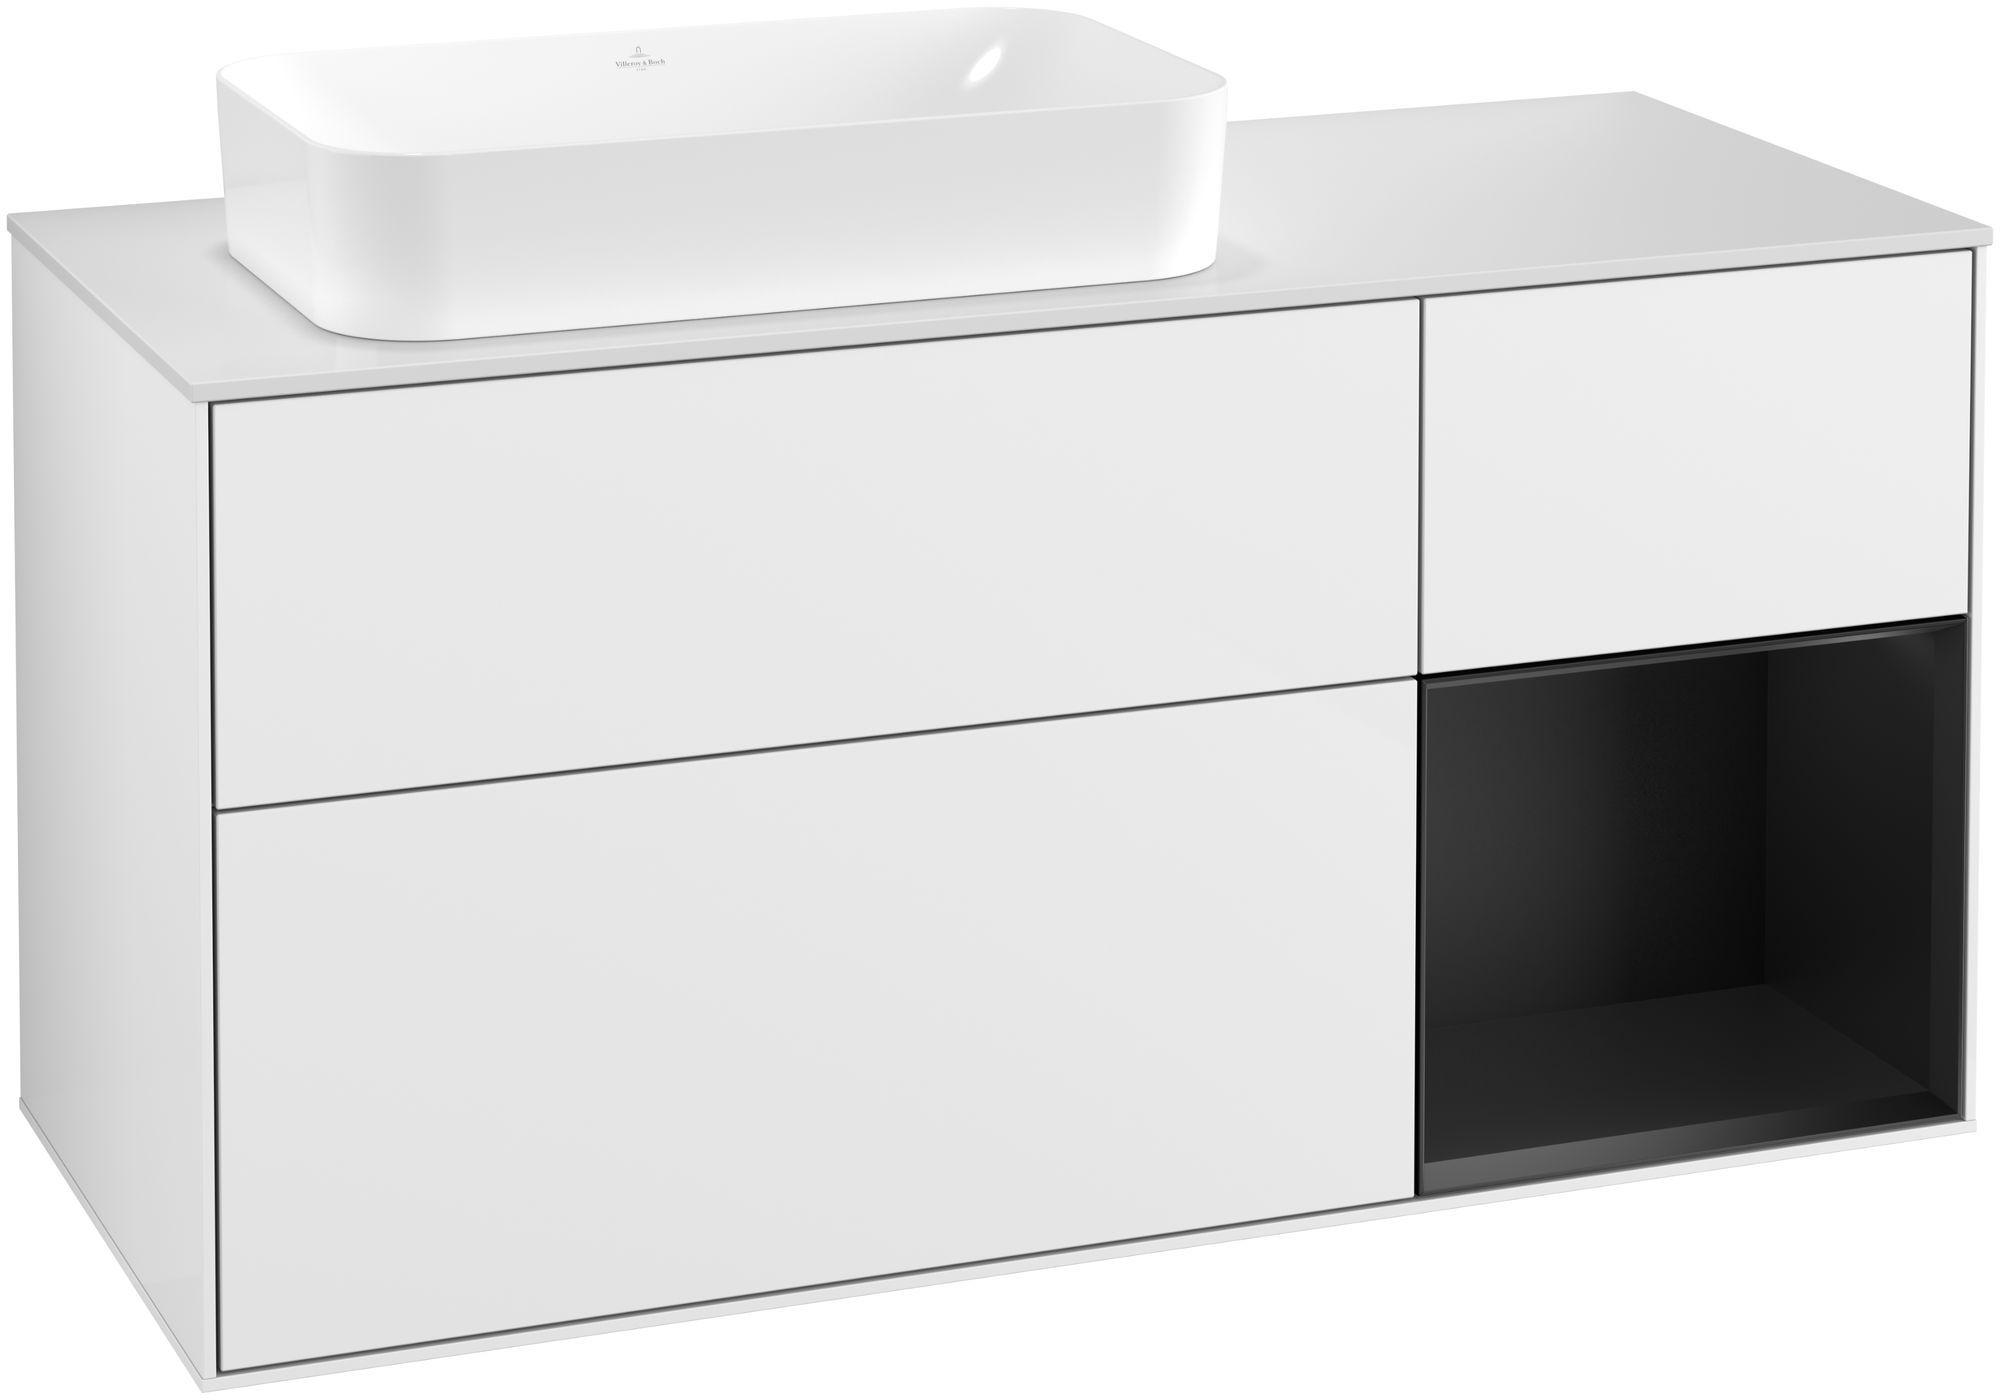 Villeroy & Boch Finion F28 Waschtischunterschrank mit Regalelement 3 Auszüge Waschtisch links LED-Beleuchtung B:120xH:60,3xT:50,1cm Front, Korpus: Glossy White Lack, Regal: Black Matt Lacquer, Glasplatte: White Matt F281PDGF